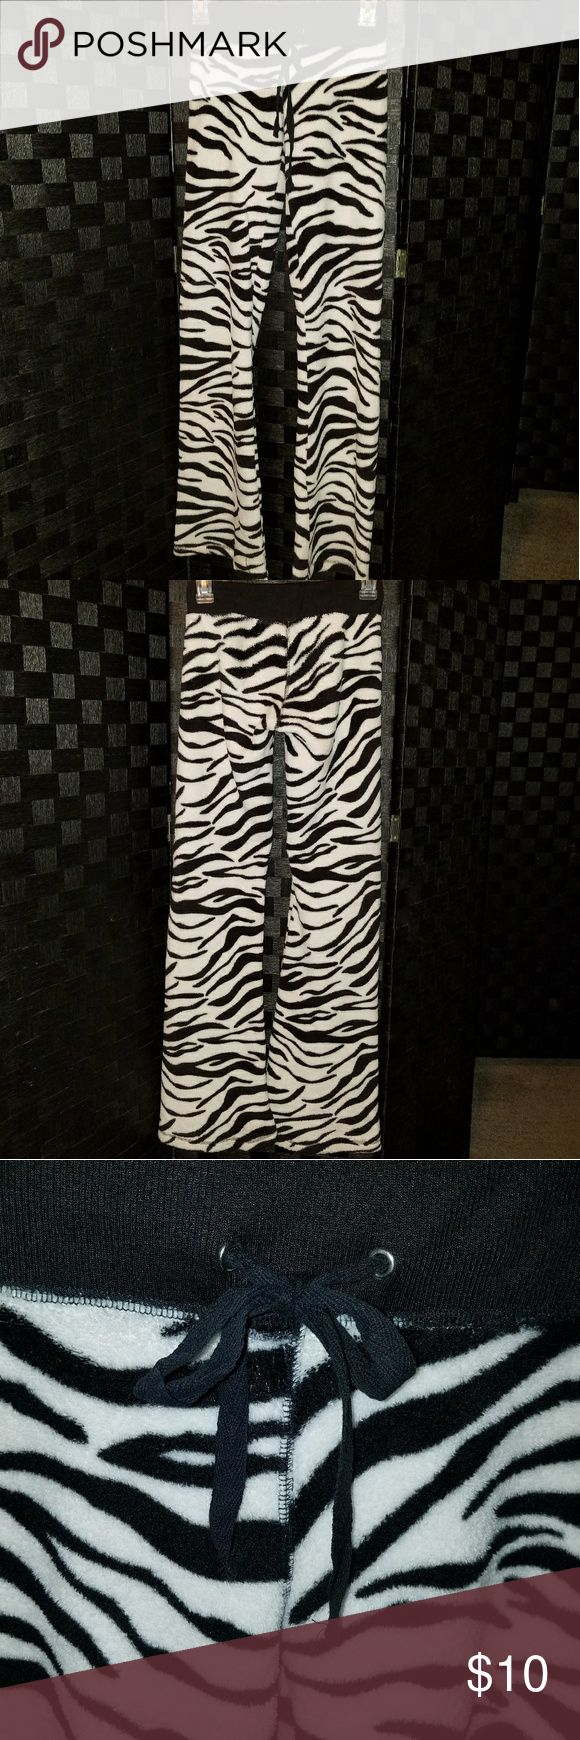 🆕 Derek Heart Lounge Pants Super soft and comfy wide leg zebra lounge/sleep pants by Derek Heart. Size XS and 100% Polyester. Derek Heart Intimates & Sleepwear